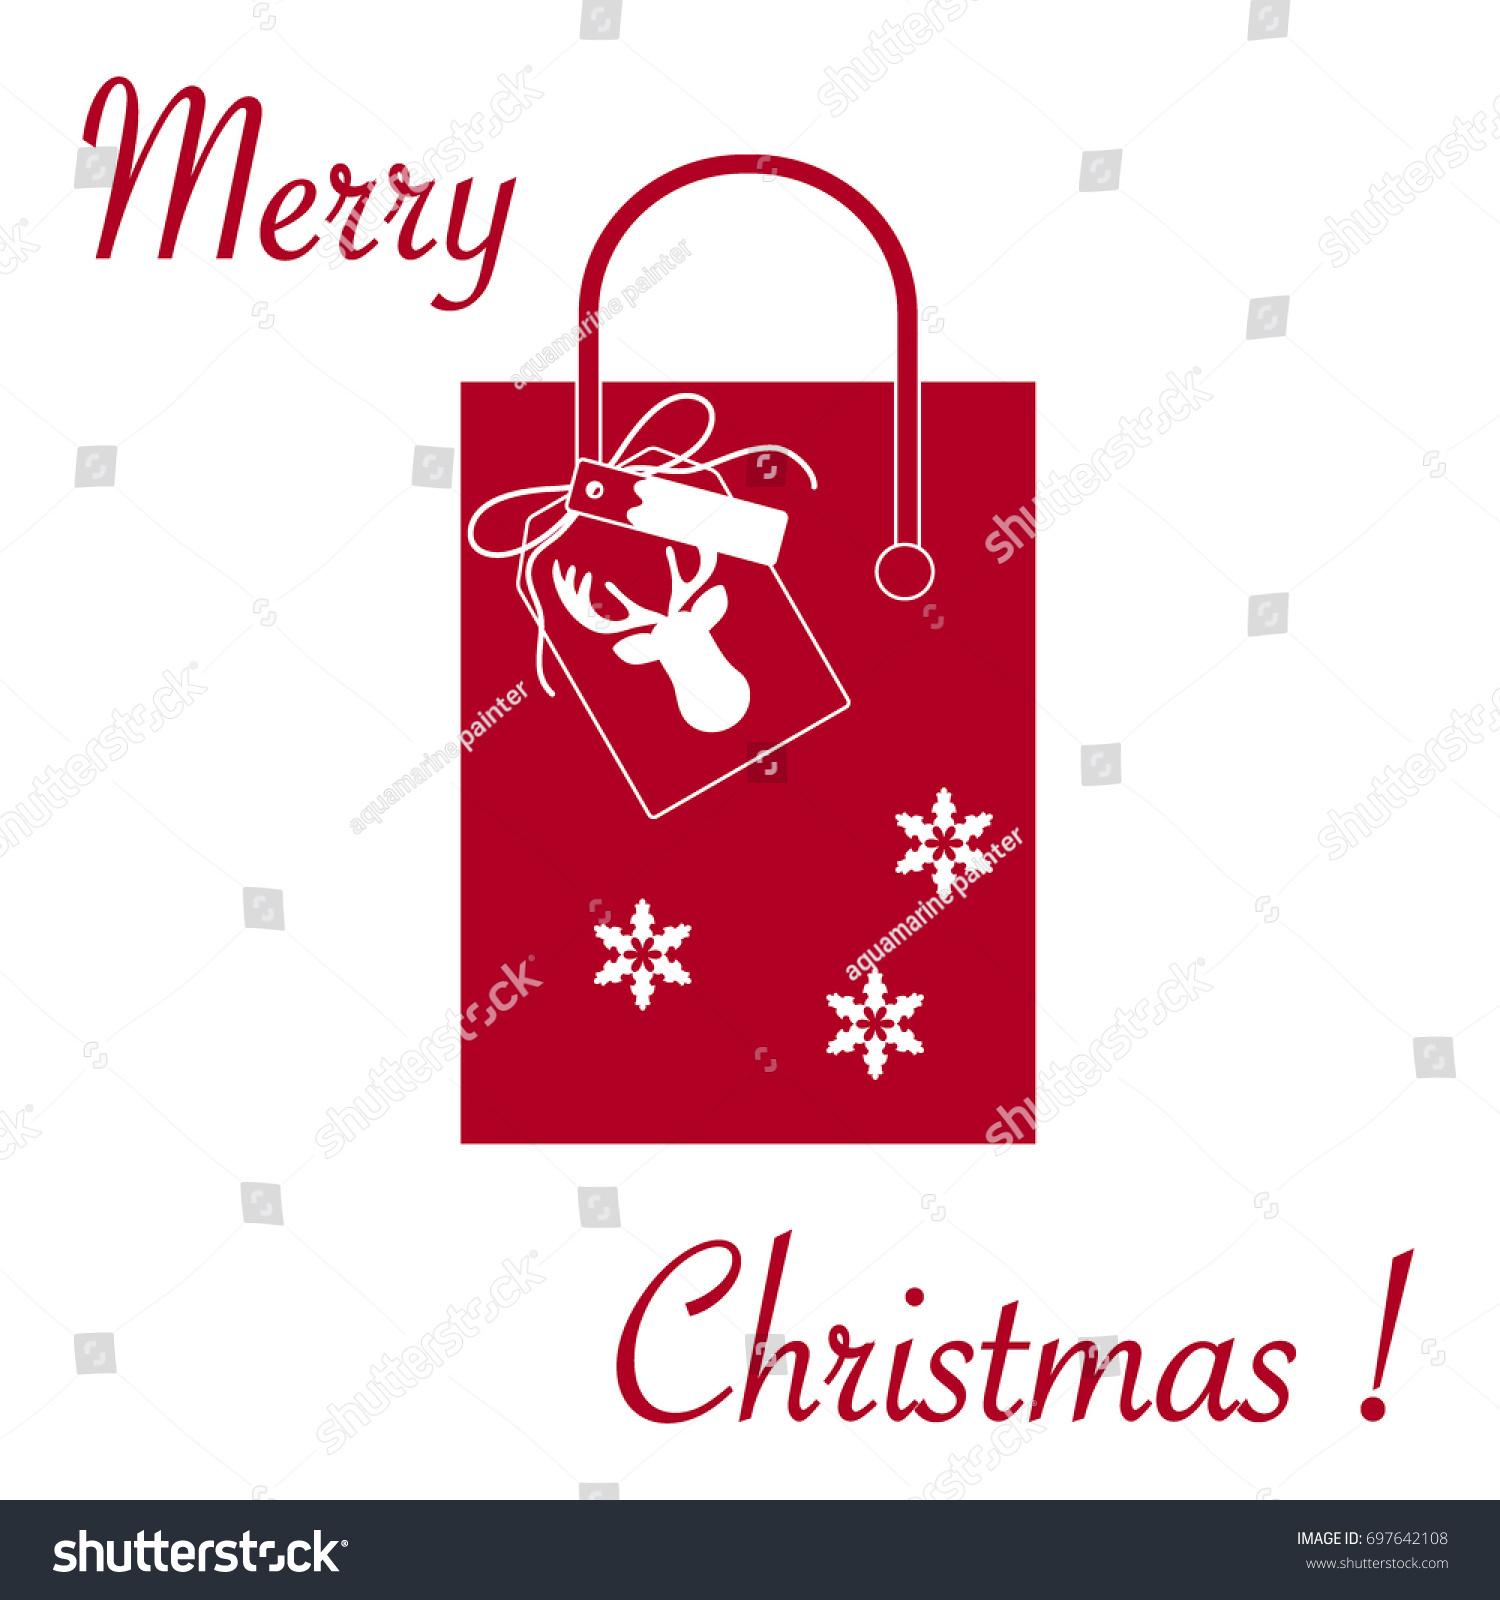 Cute Vector Illustration Gift Bag Snowflakes Stock Vector (Royalty ...